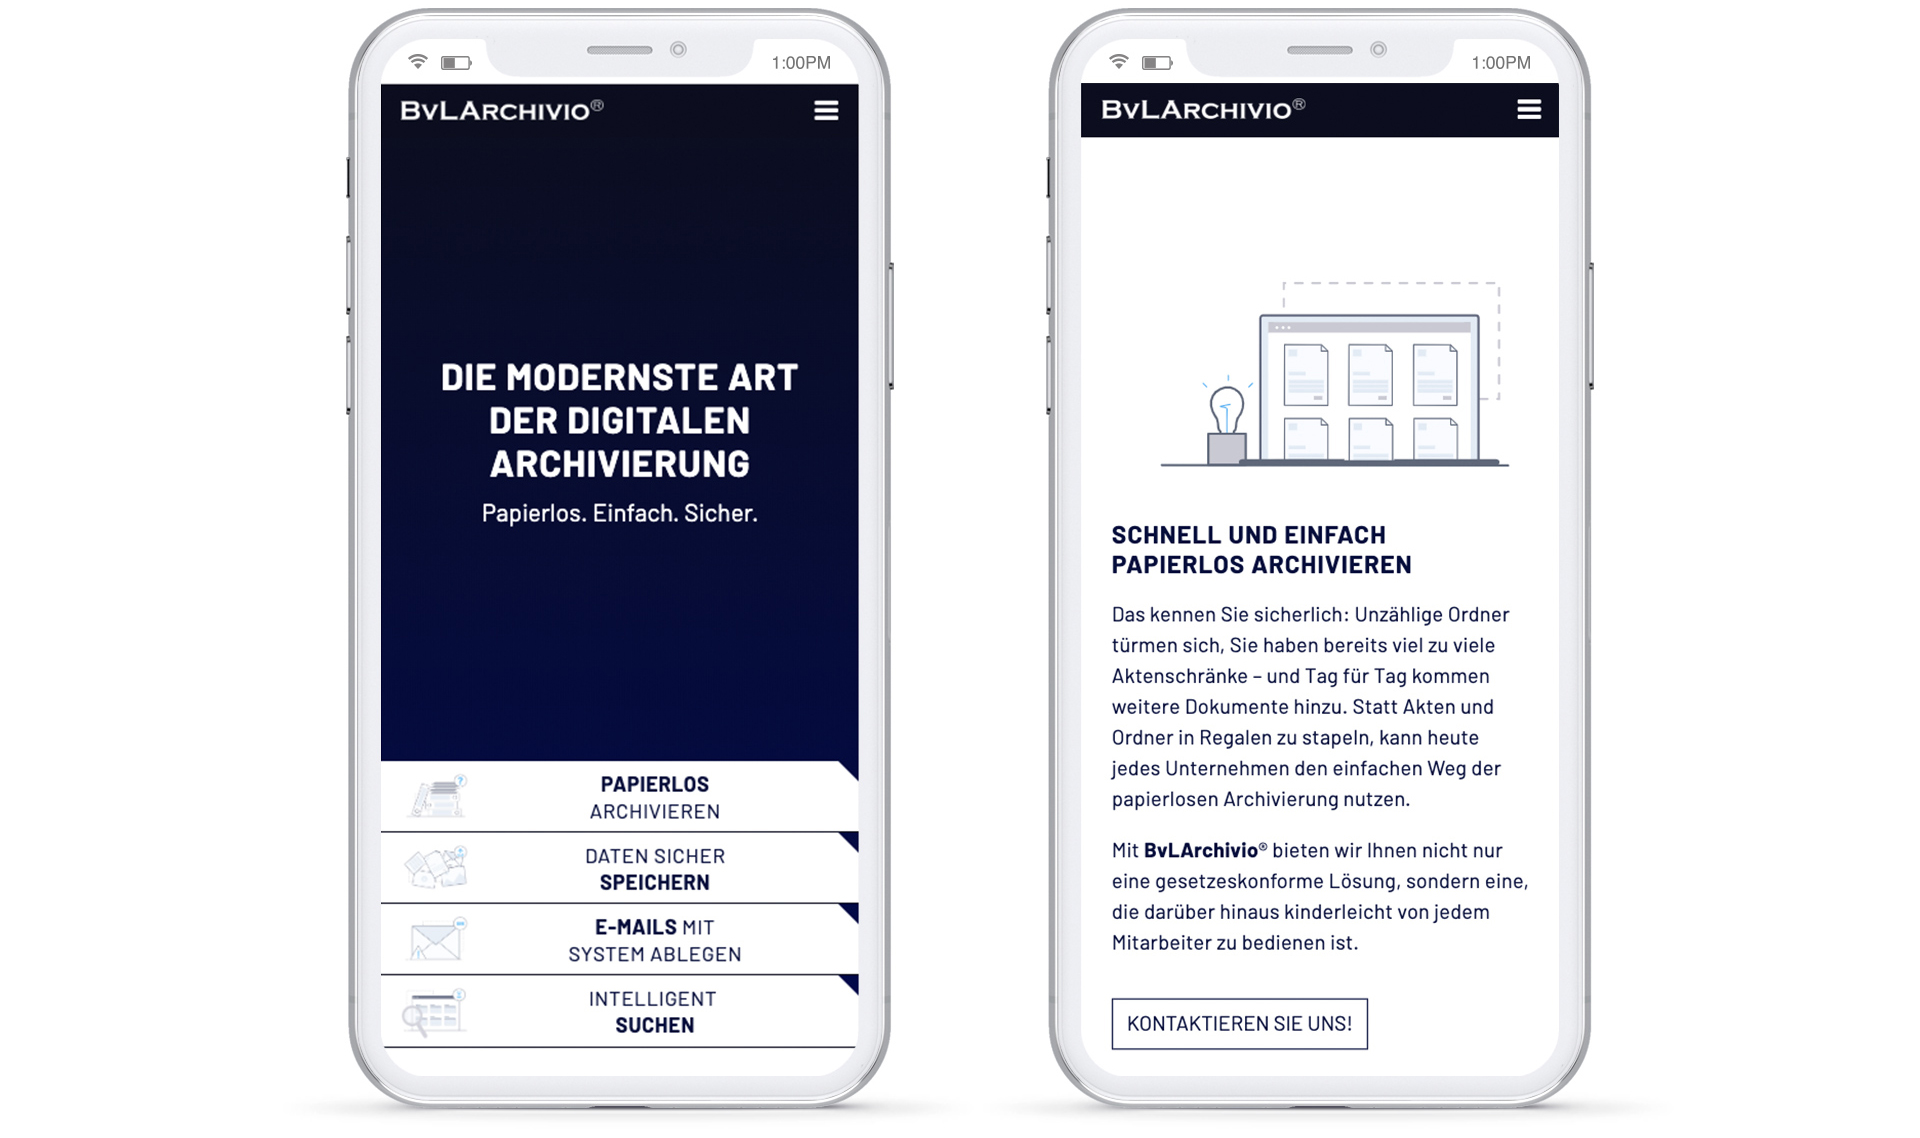 Abbildung-website-bvl-archivio-iphone